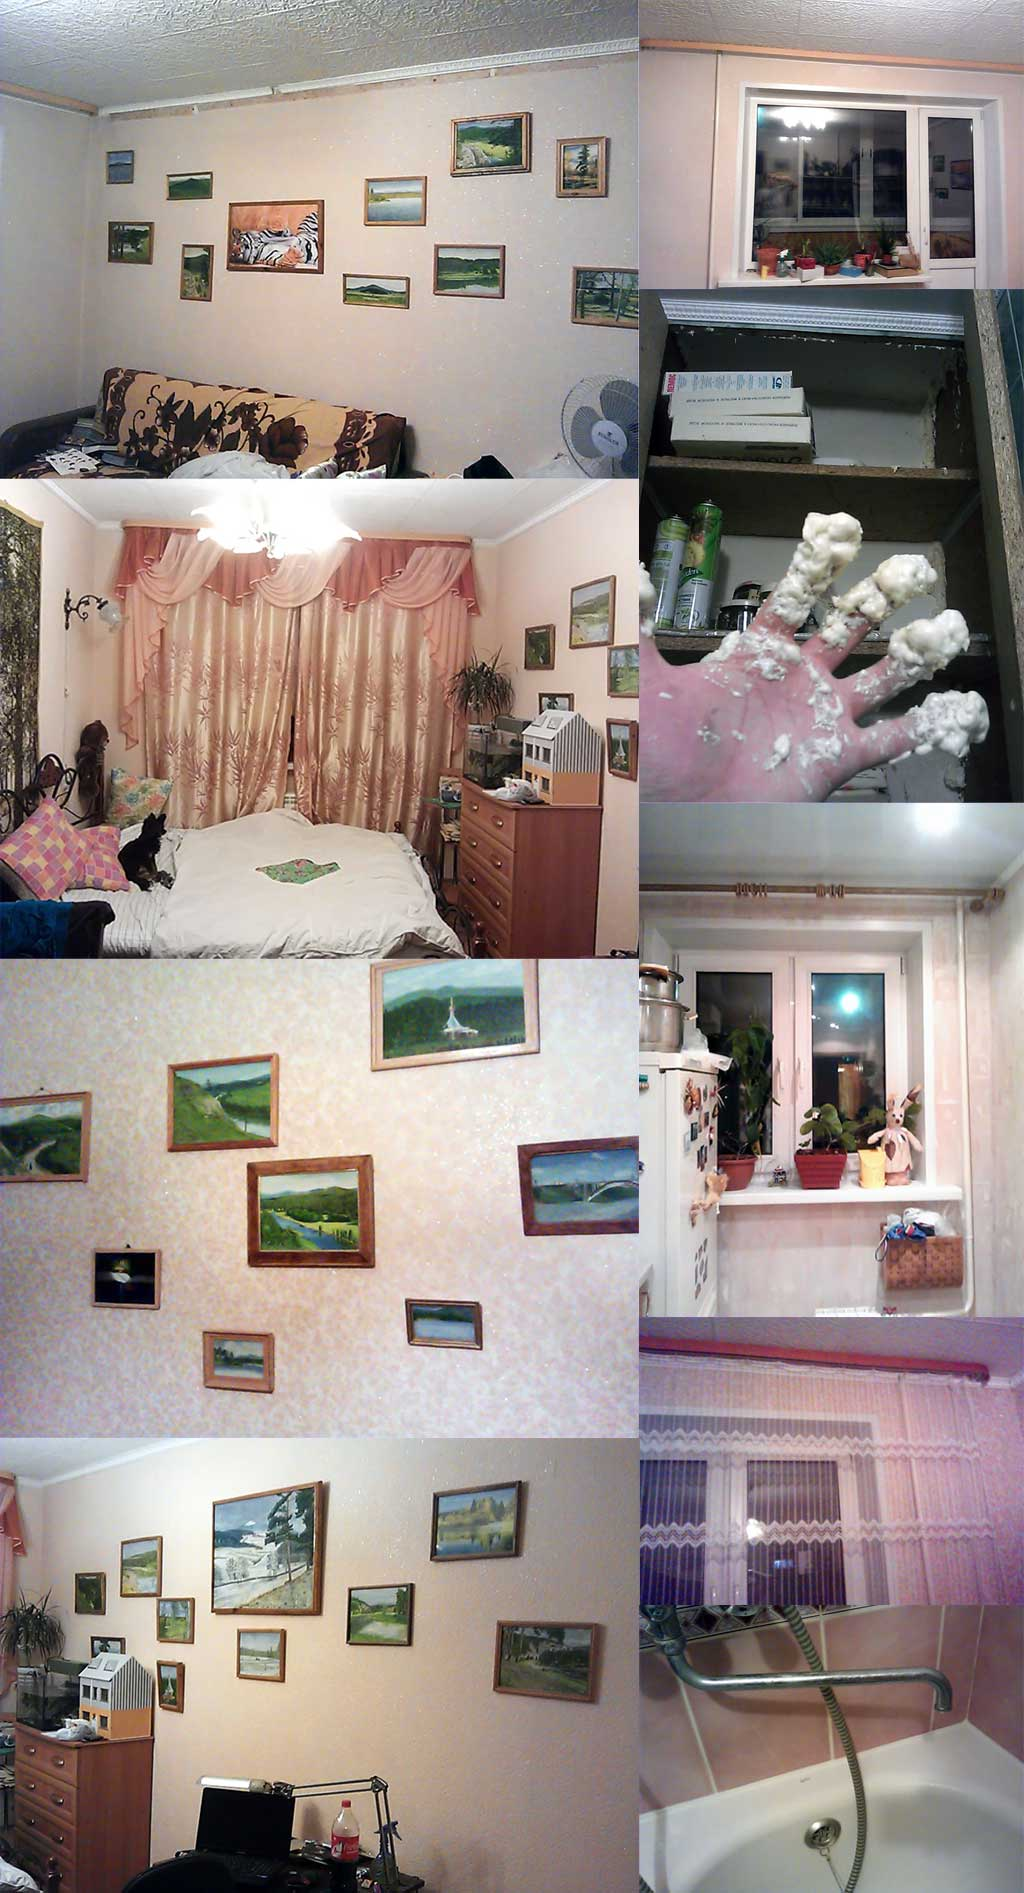 (02.02.2014 blogger) Делаем ремонт - После переезда